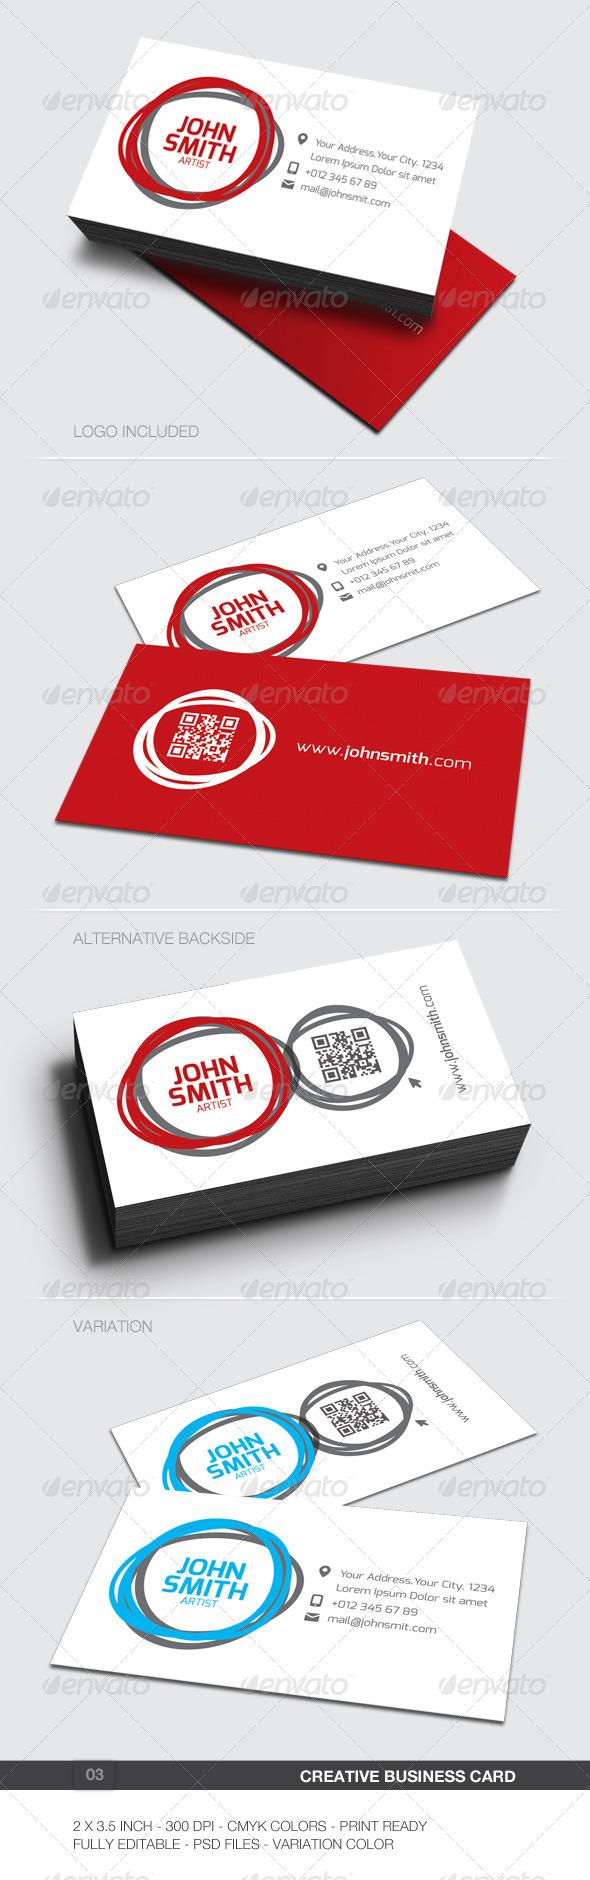 Creative Business Card - 03 - Creative Business Cards